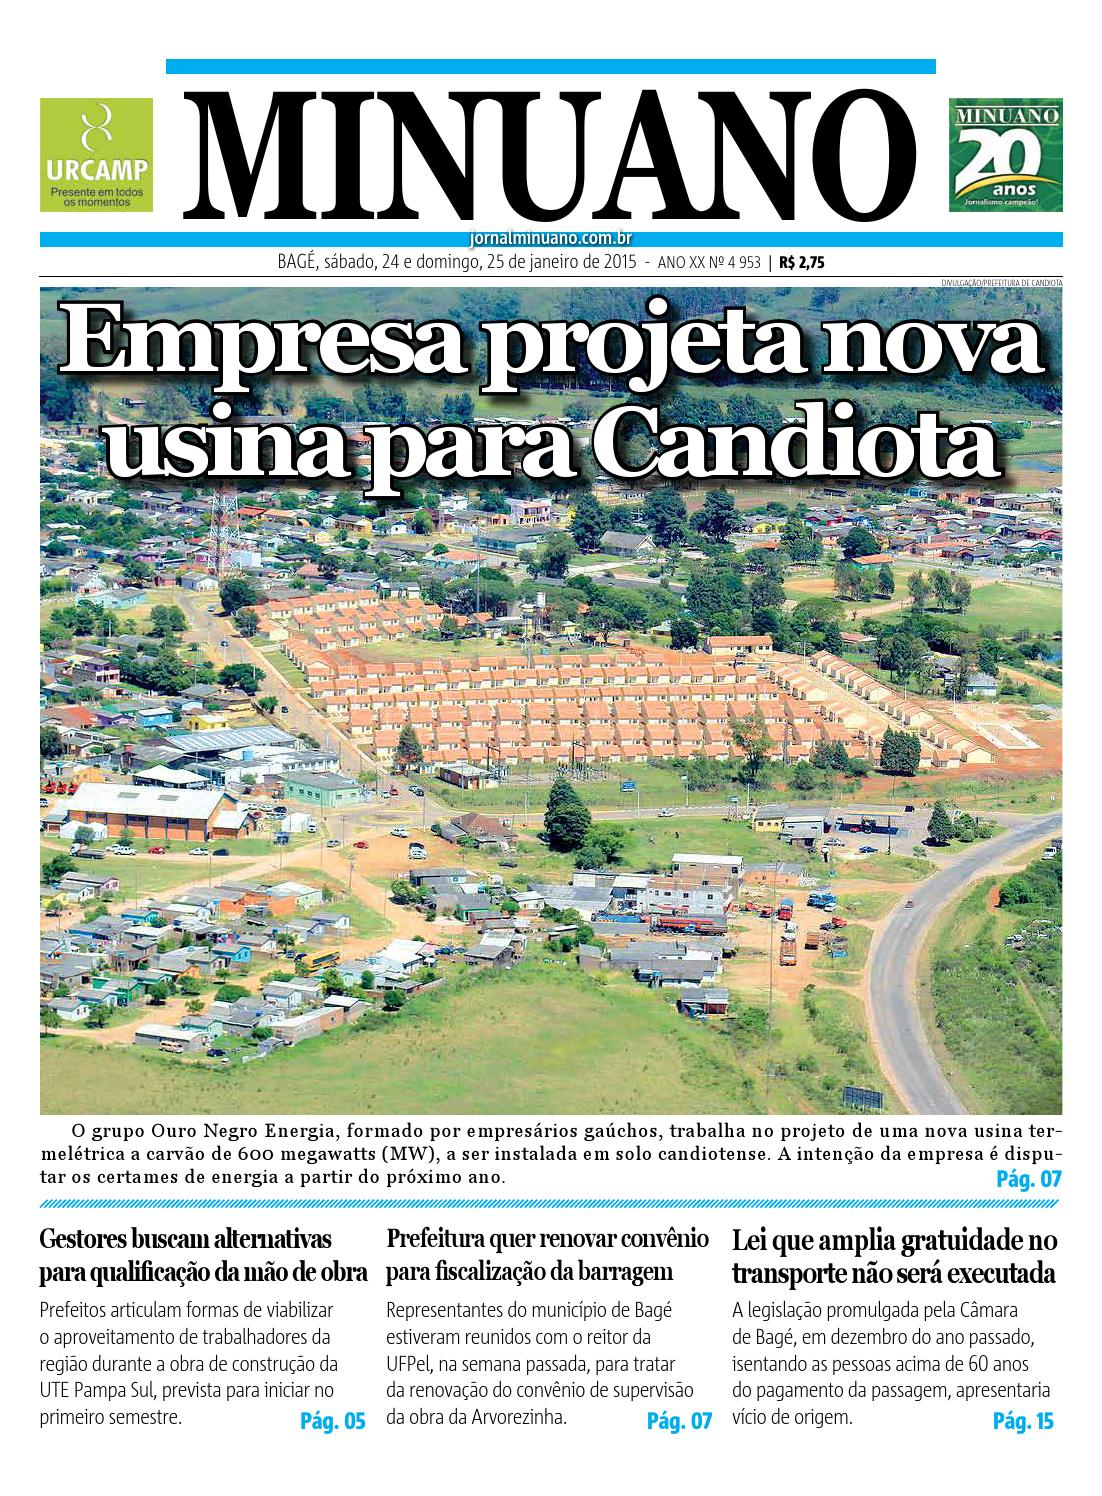 20150124 by Jornal Minuano - issuu cd83ffab4c96e